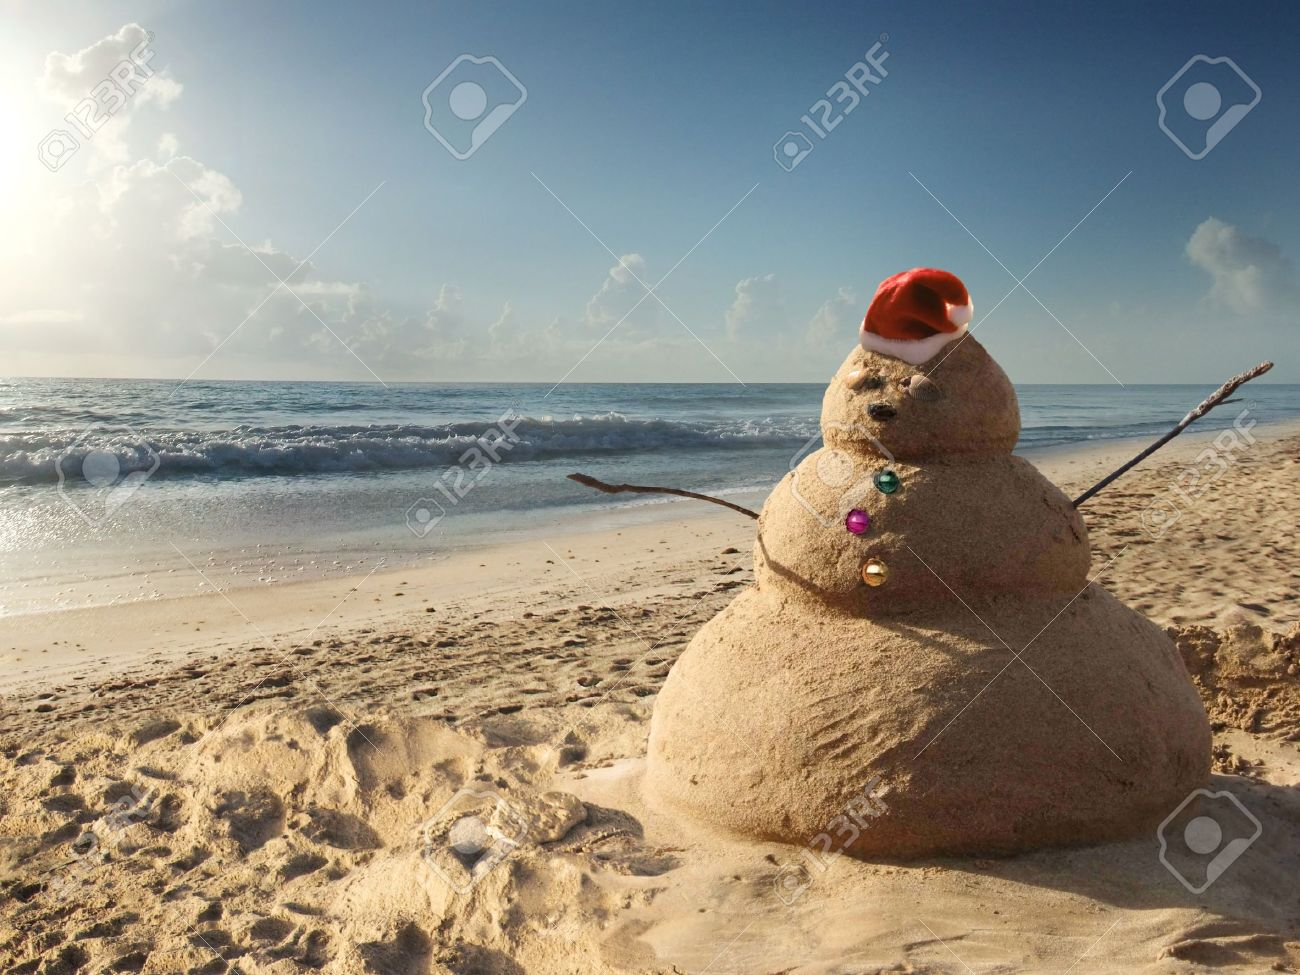 Christmas Beach.Christmas Sandman At The Beach Holiday Concept